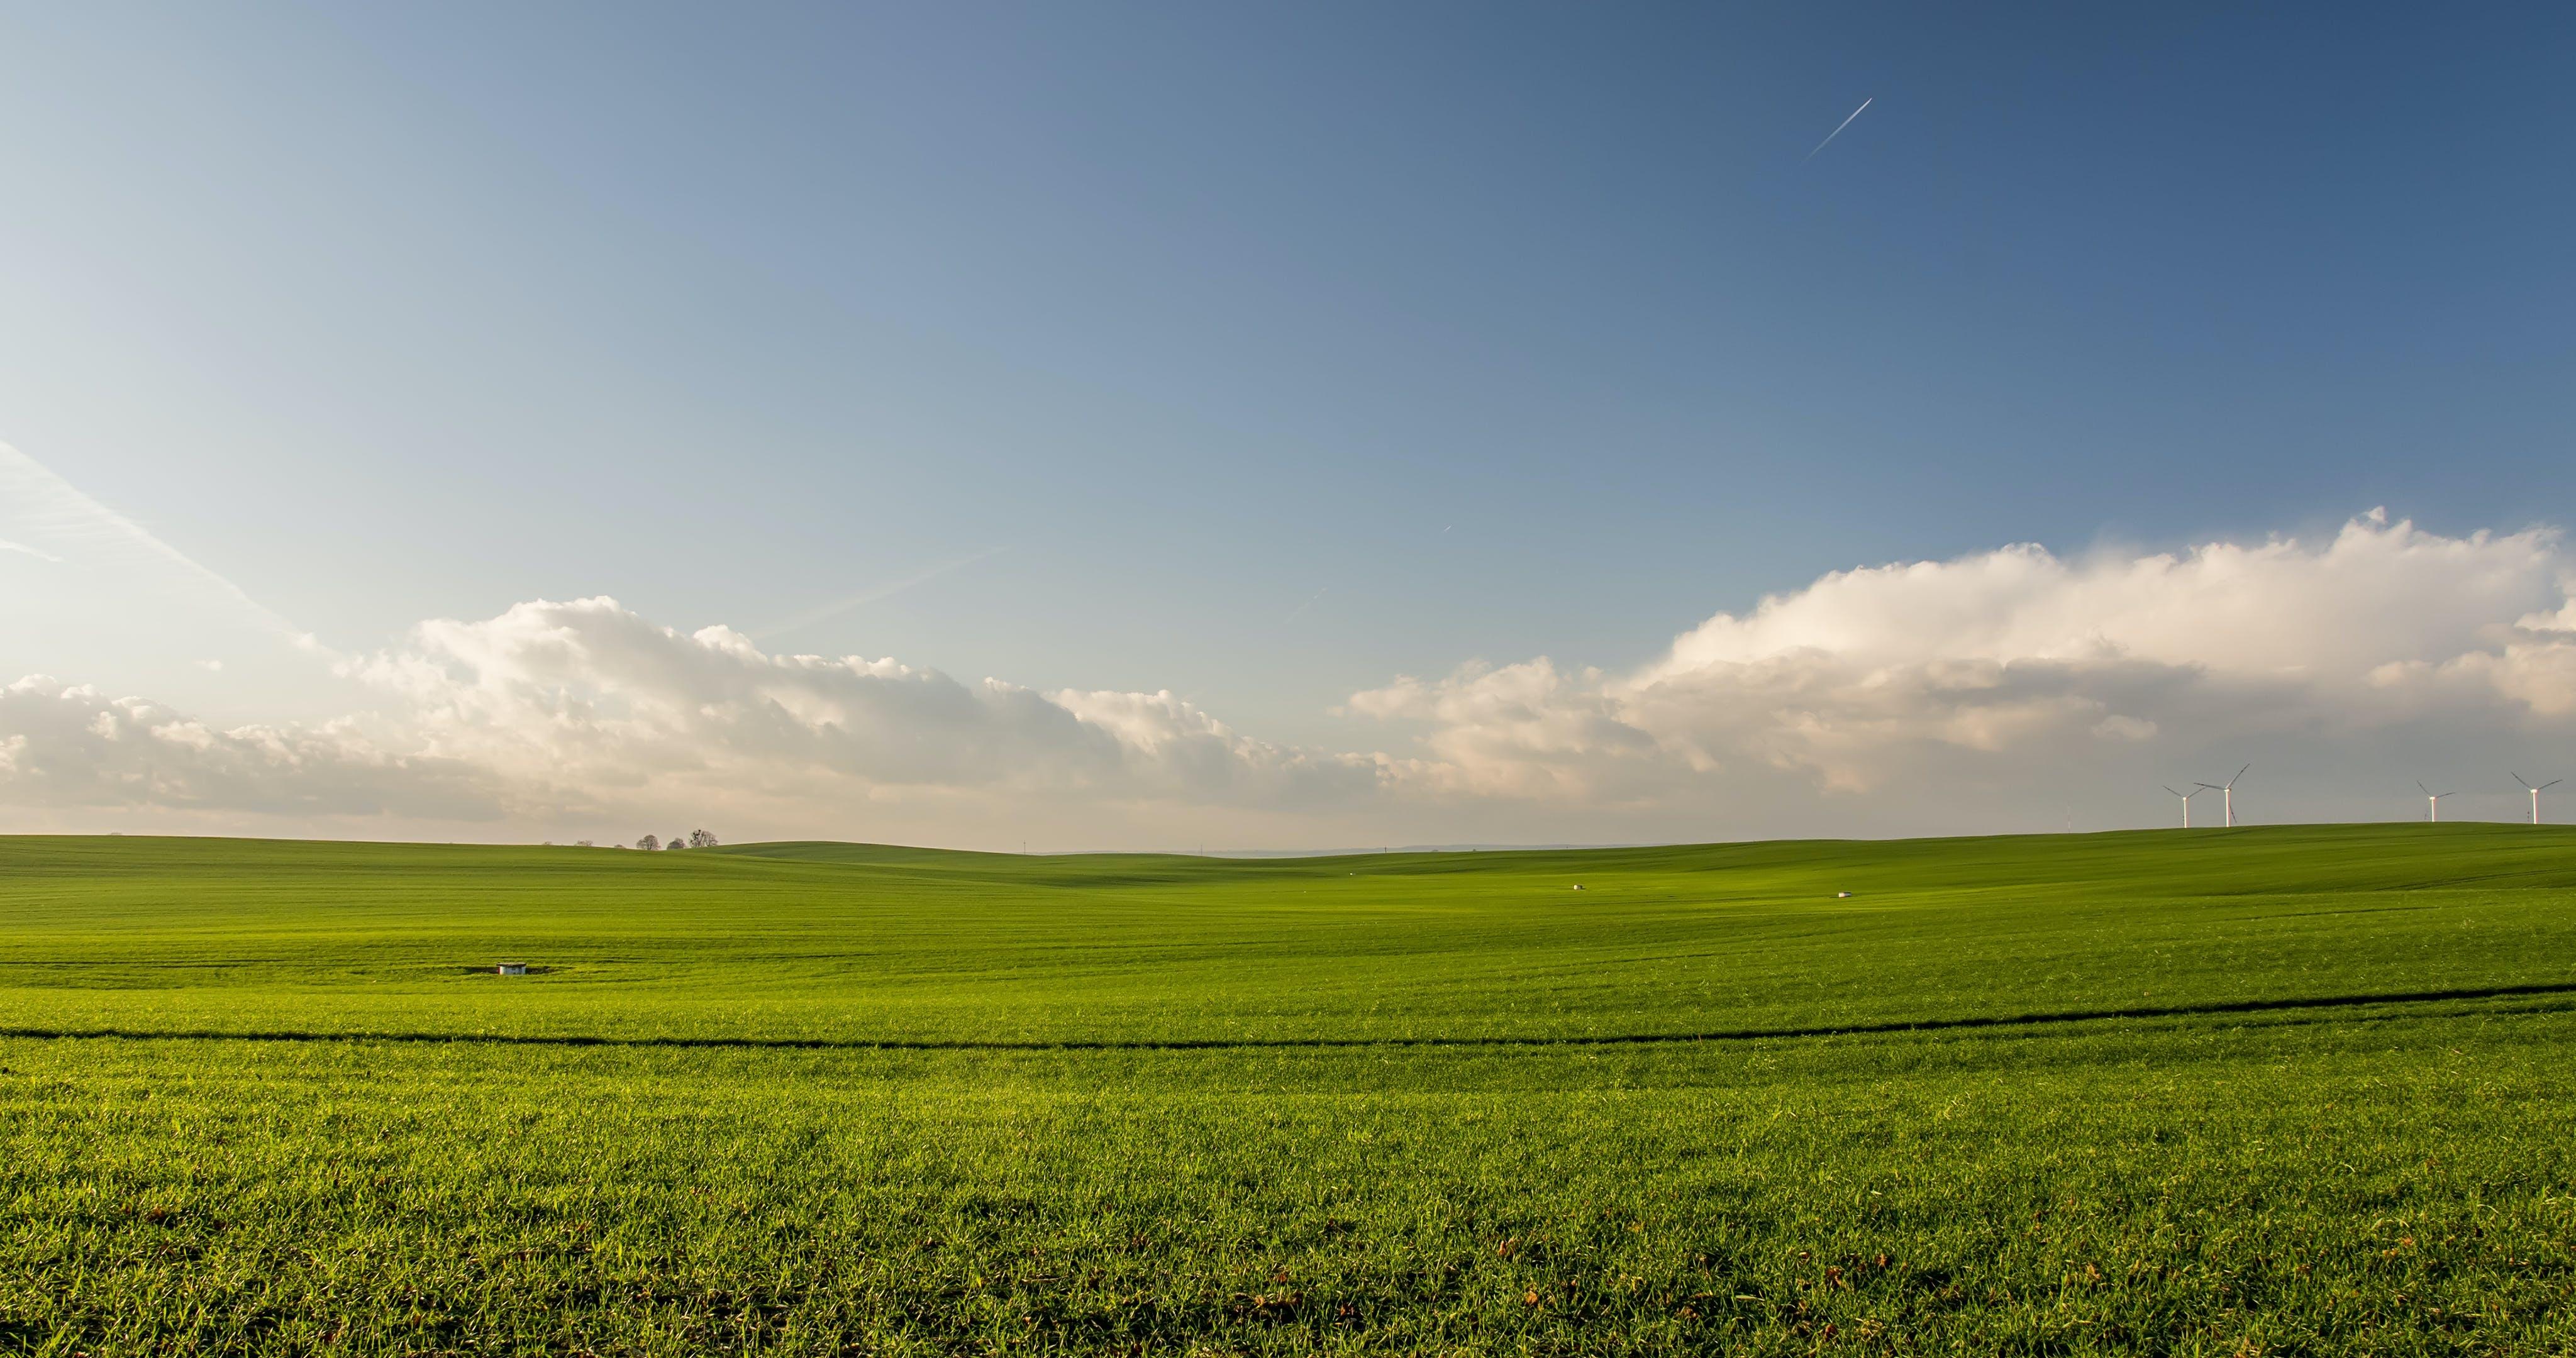 Fotos de stock gratuitas de aerogenerador, agricultura, campo, campos de cultivo